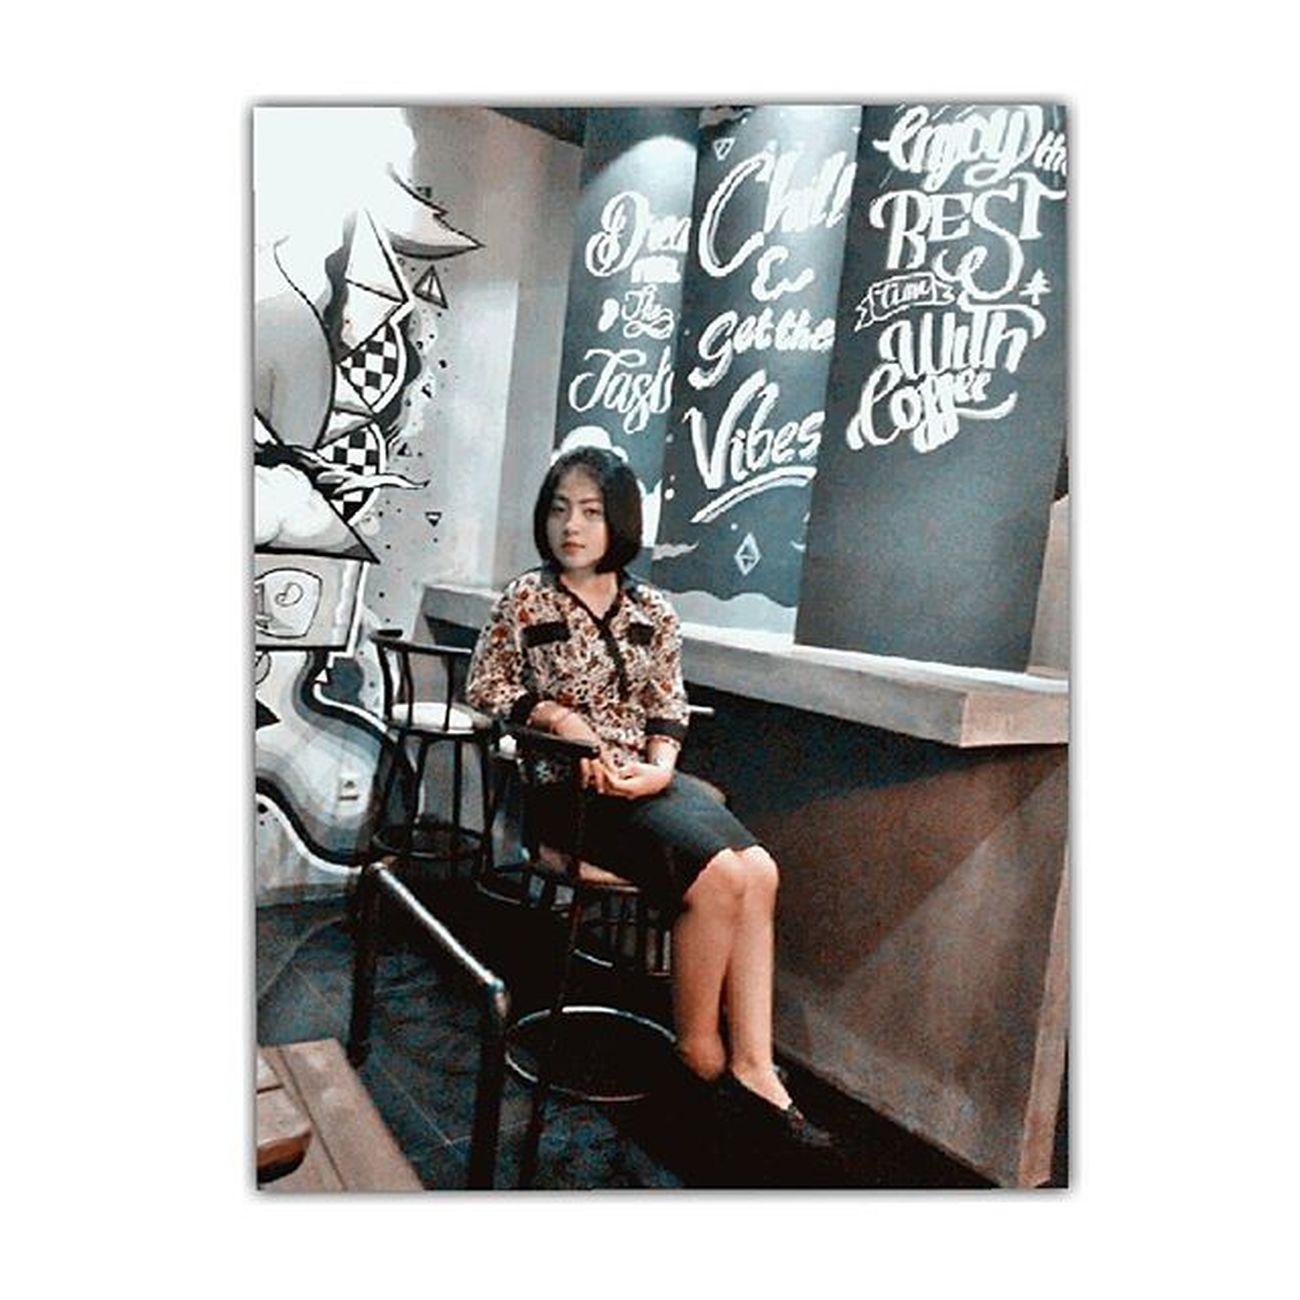 Tambah lemu tambah bunder tambah subur . Wenesdaynight Instagram Instapic Widyahanggra Milkshake Coffee Girl Photooftheday Nightout Simple Diloncoffeeeatery Stylist Meetup Cece Sista Bobhaircut Like4like Likforfollow